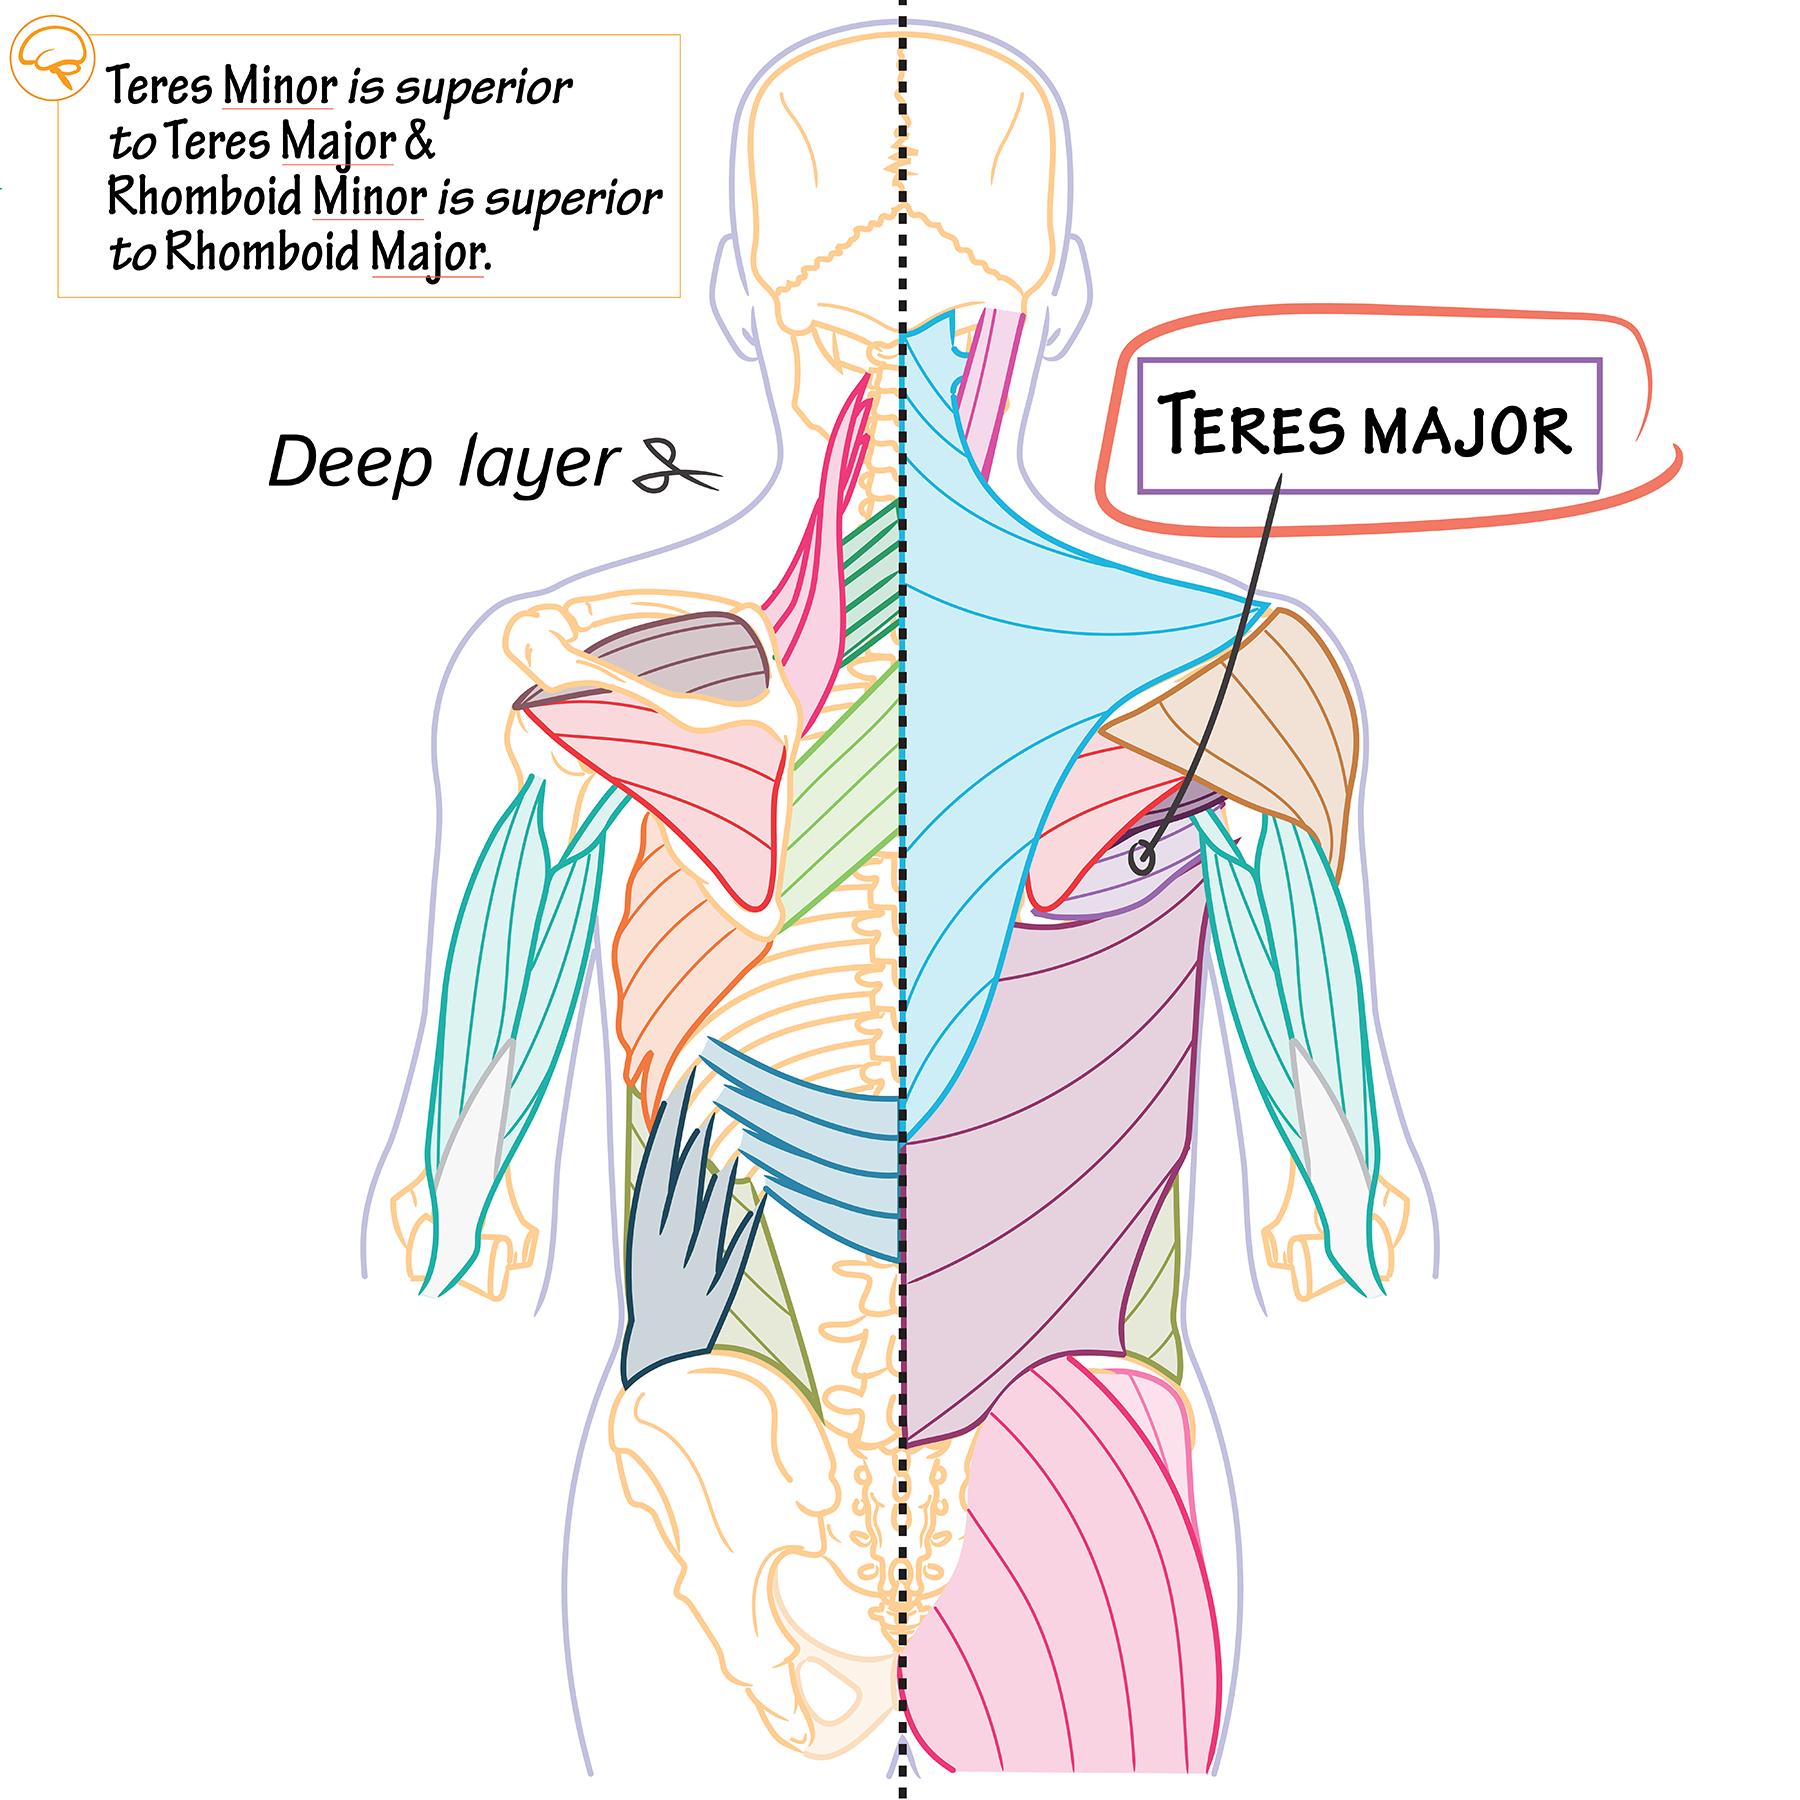 Gross Anatomy Glossary: Teres major | Draw It to Know It